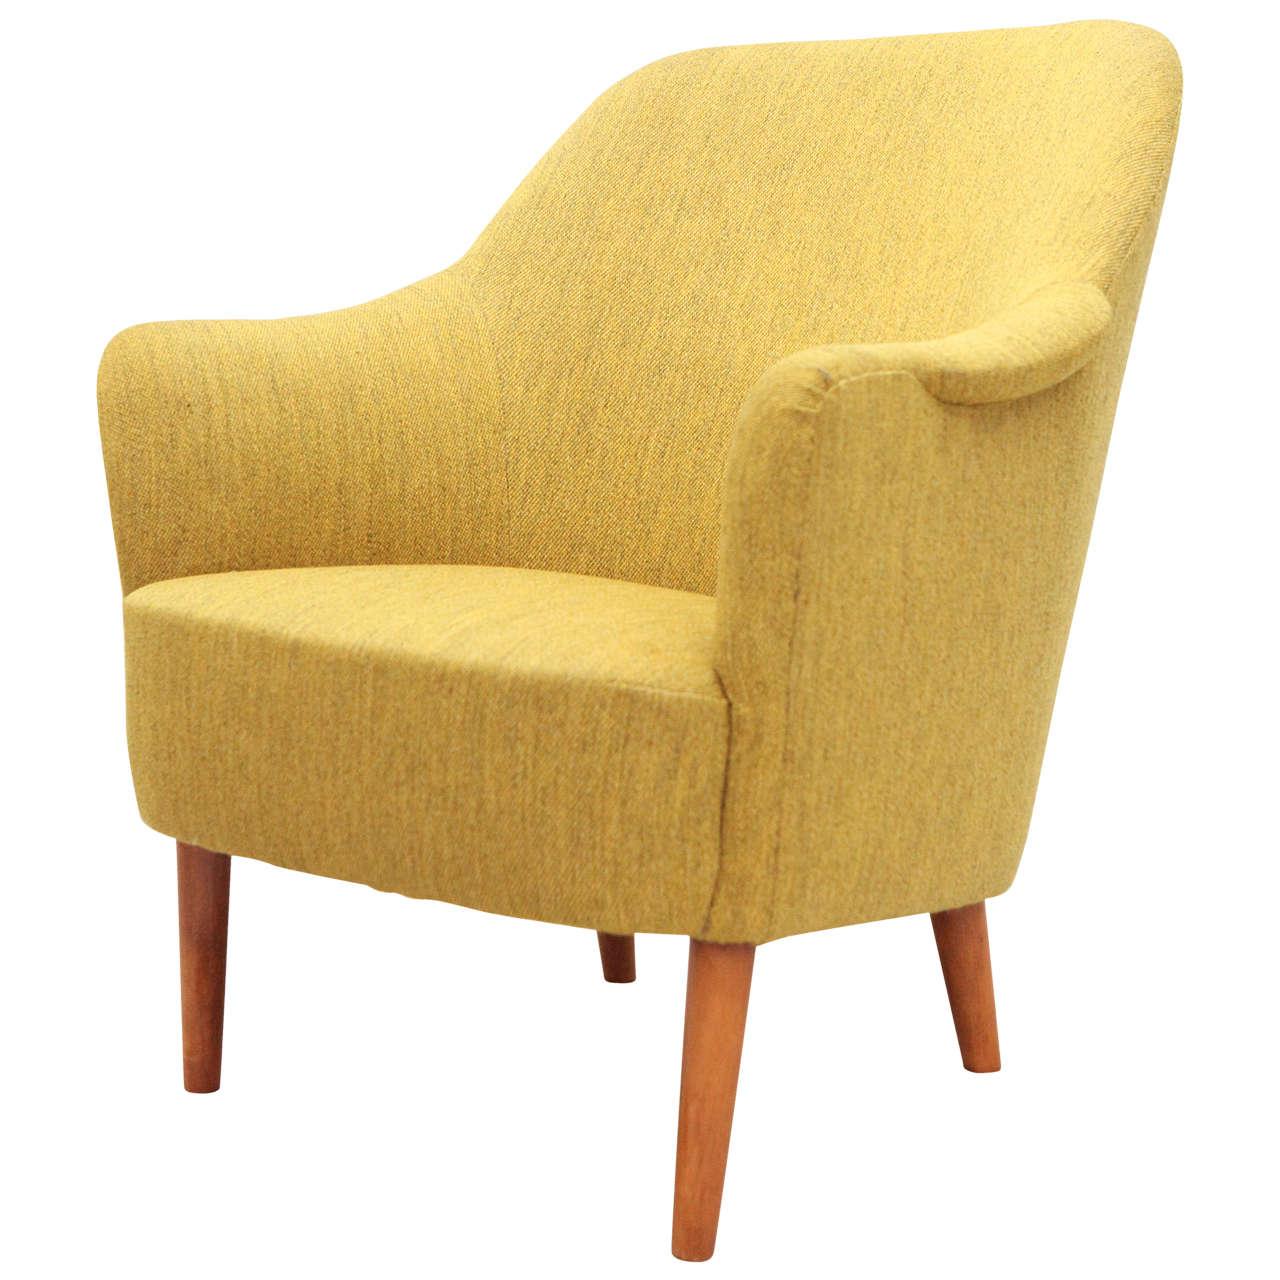 "Carl Malmsten ""Samspel"" Lounge Chair"